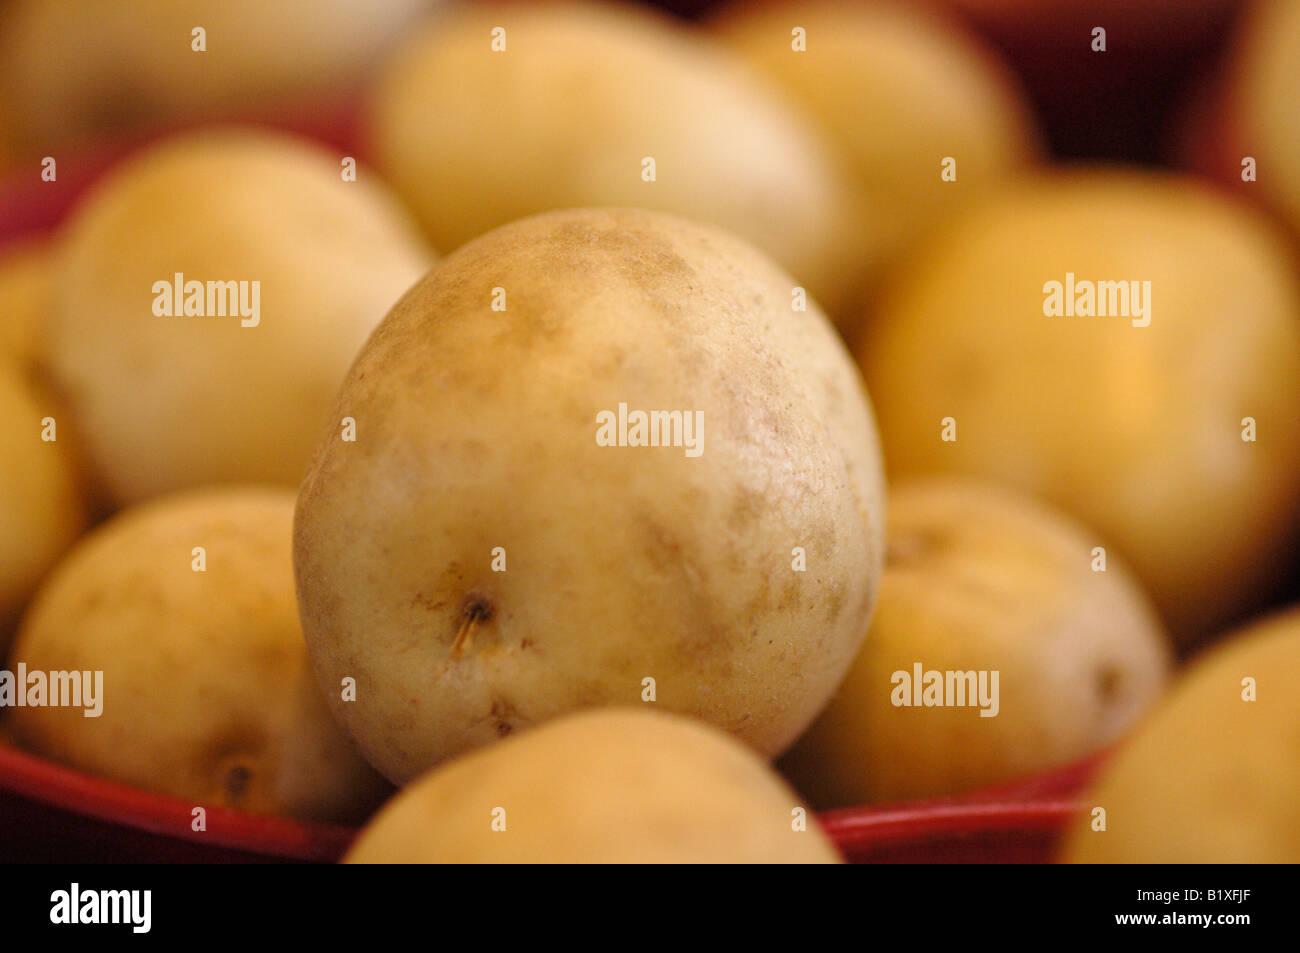 Food, Pears, closeup - Stock Image